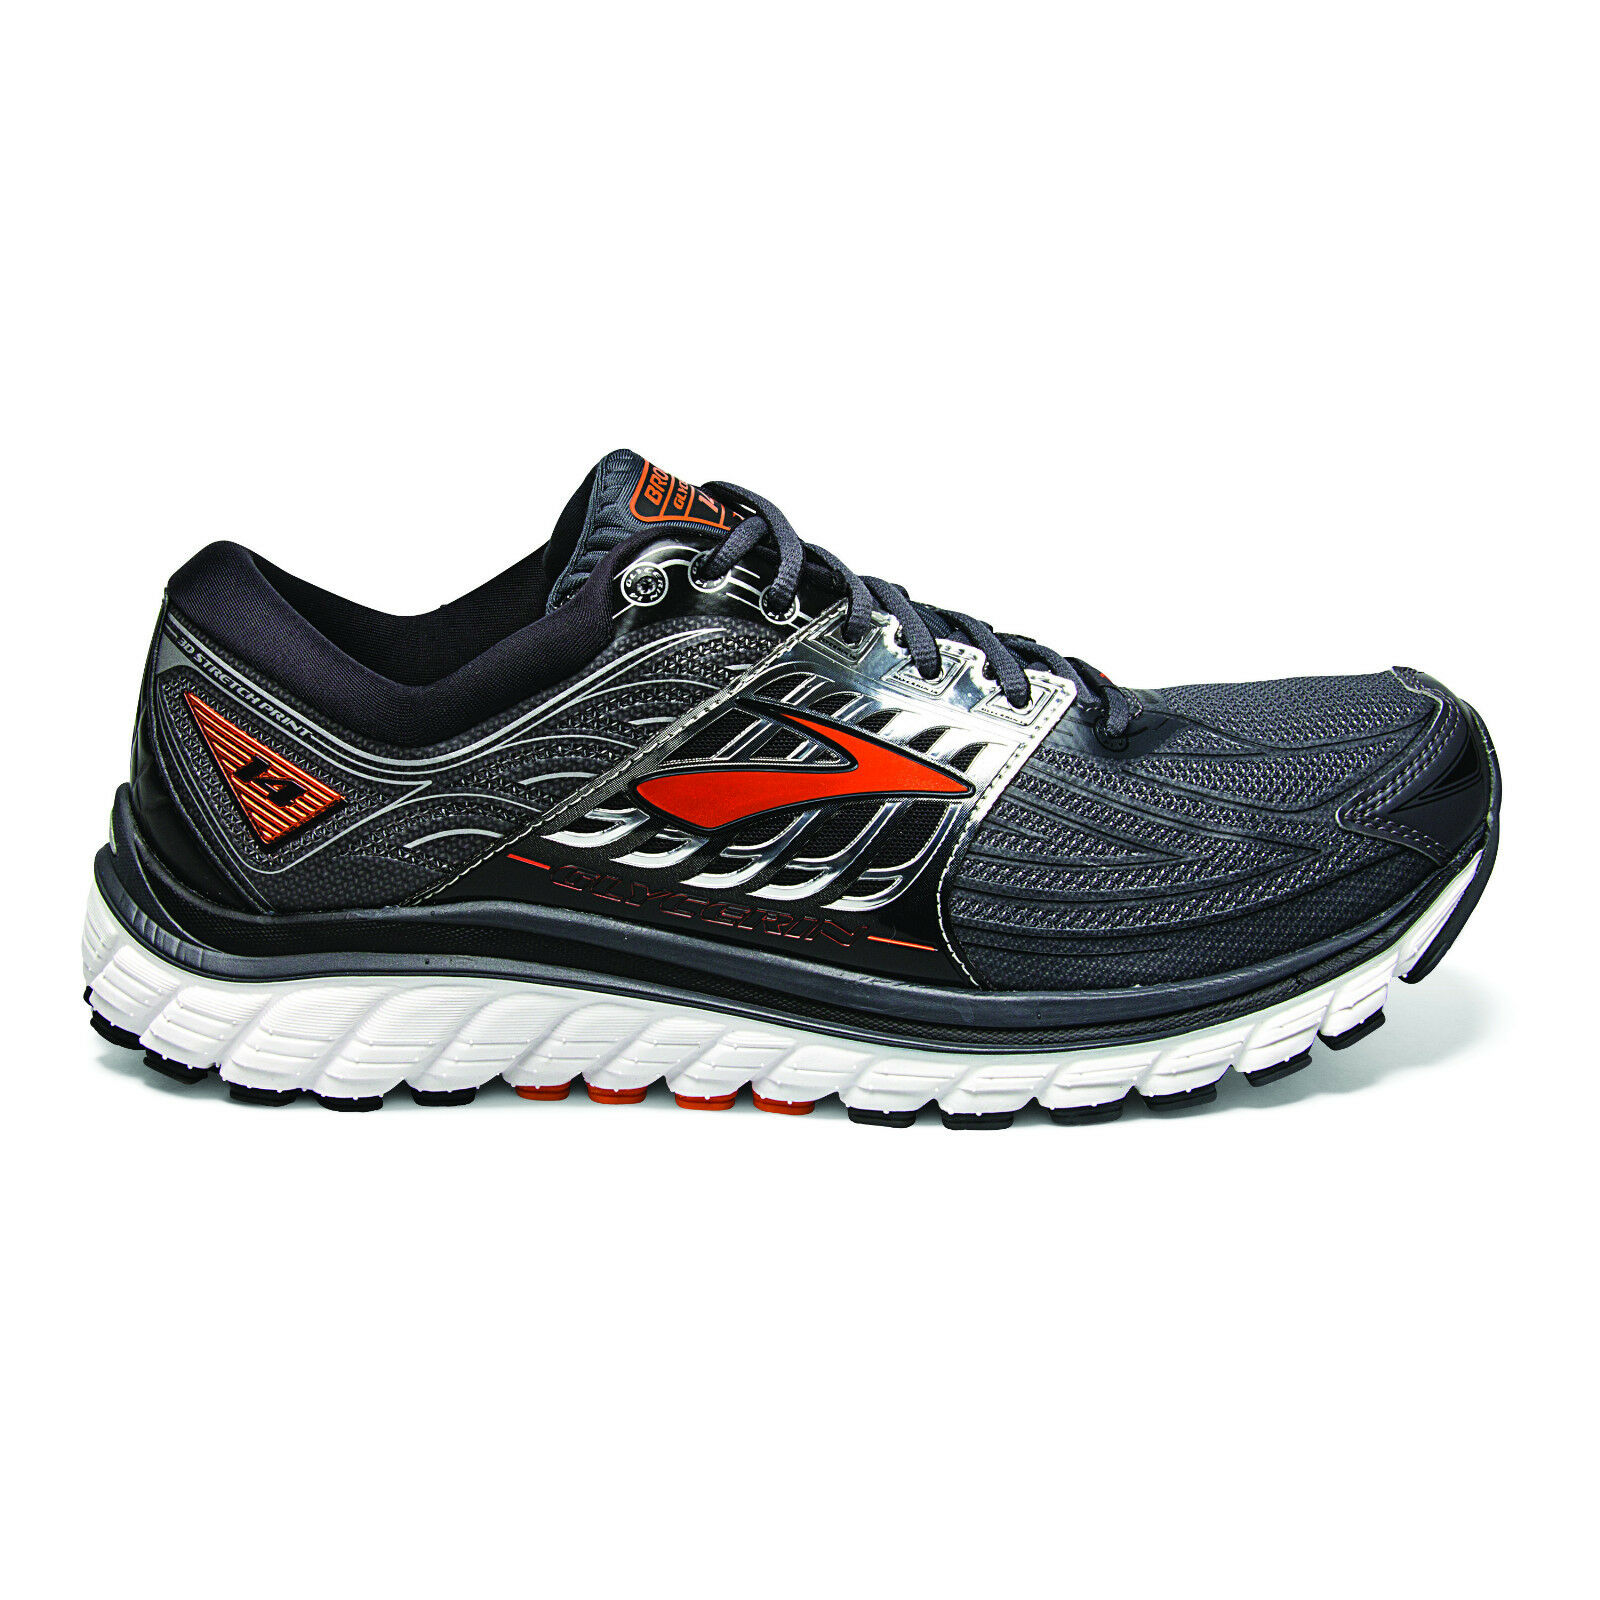 Brooks Brooks Brooks Glycerin 14 Uomo Cushioned Running scarpe (D) (075)   Buy Now  c0613a